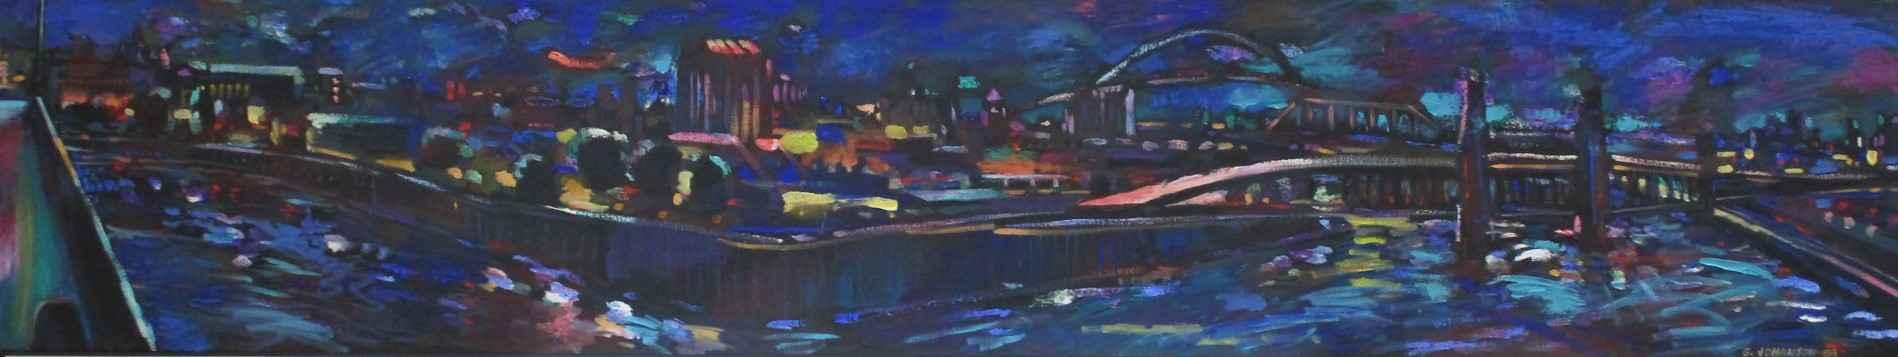 Upriver/Downriver (Ni... by  George Johanson - Masterpiece Online